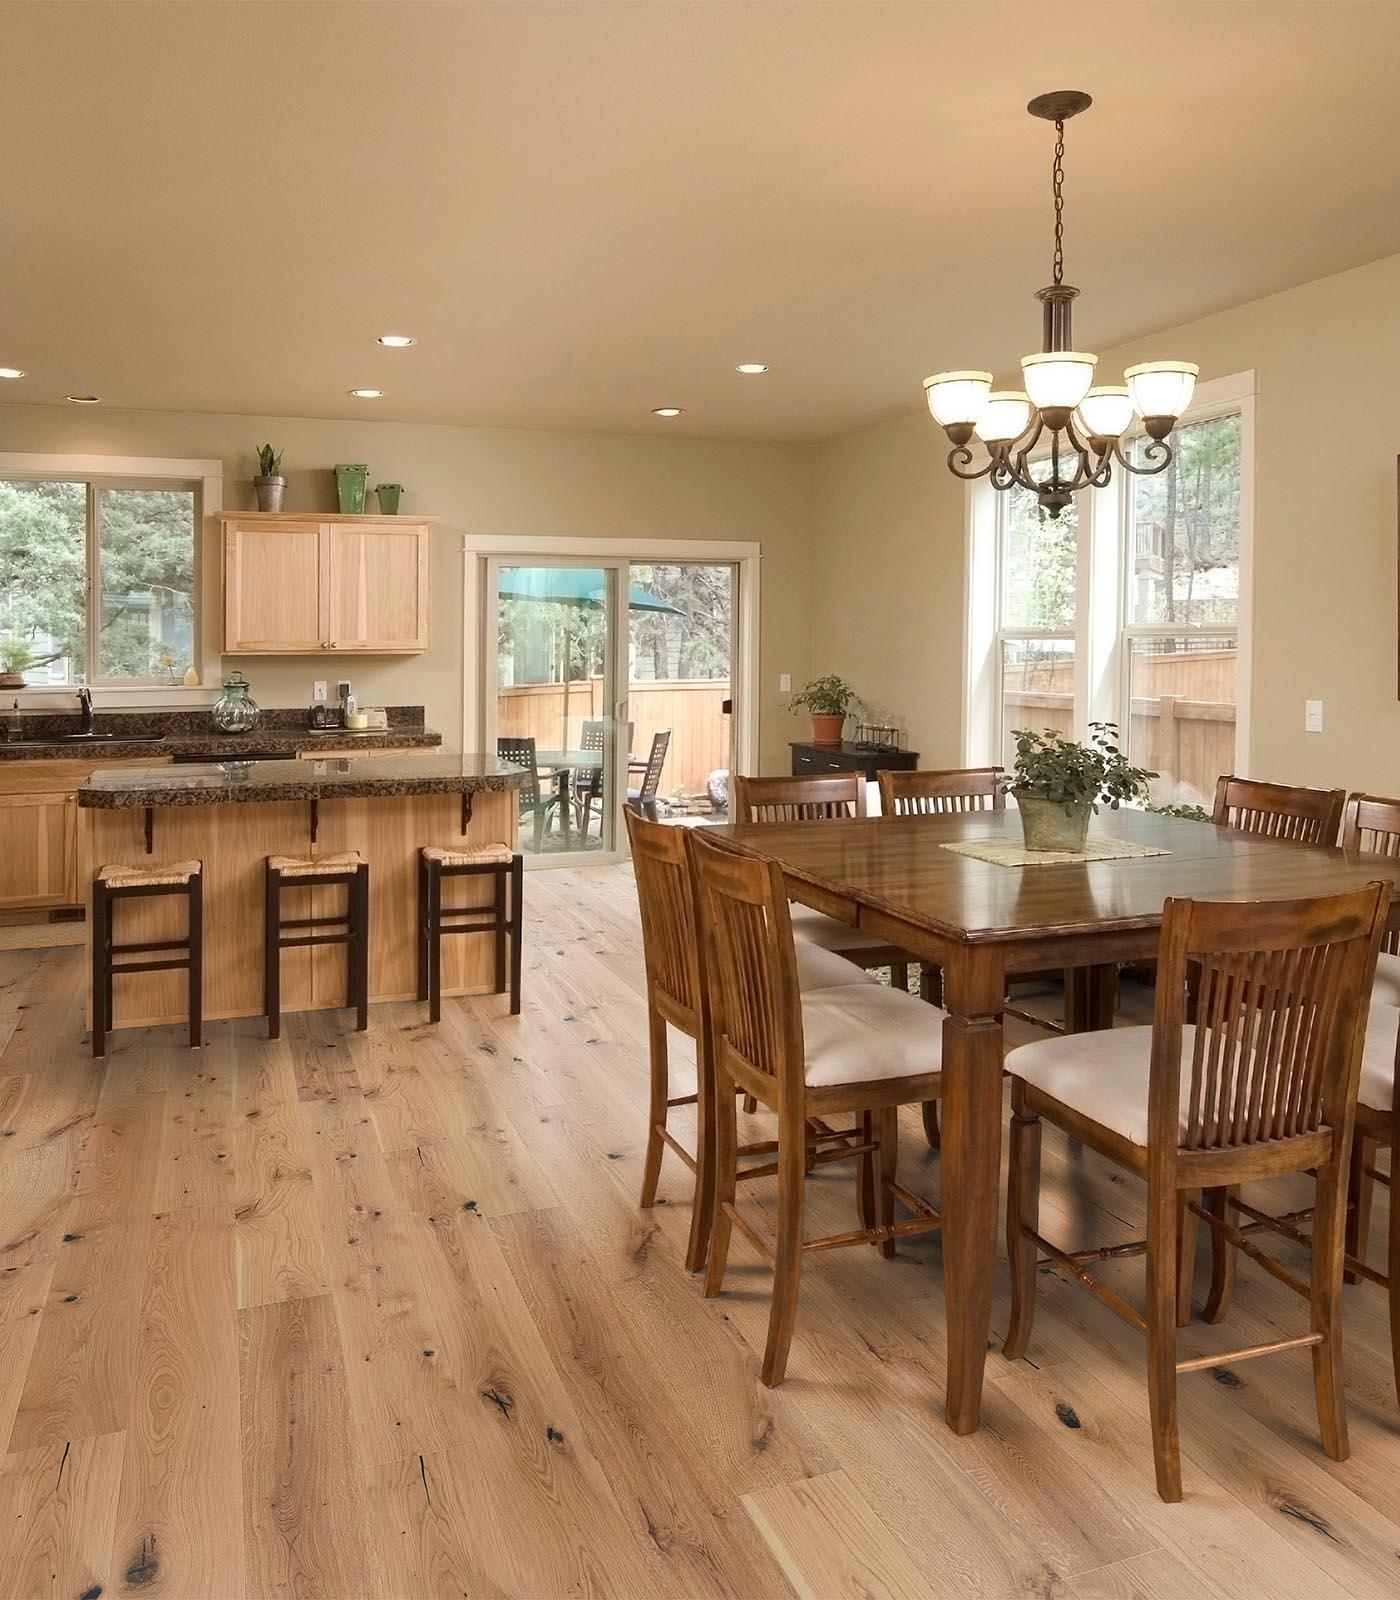 Oak Antique- Antique-grading-of-European-Oak-floors-Forestry-Timber- Room